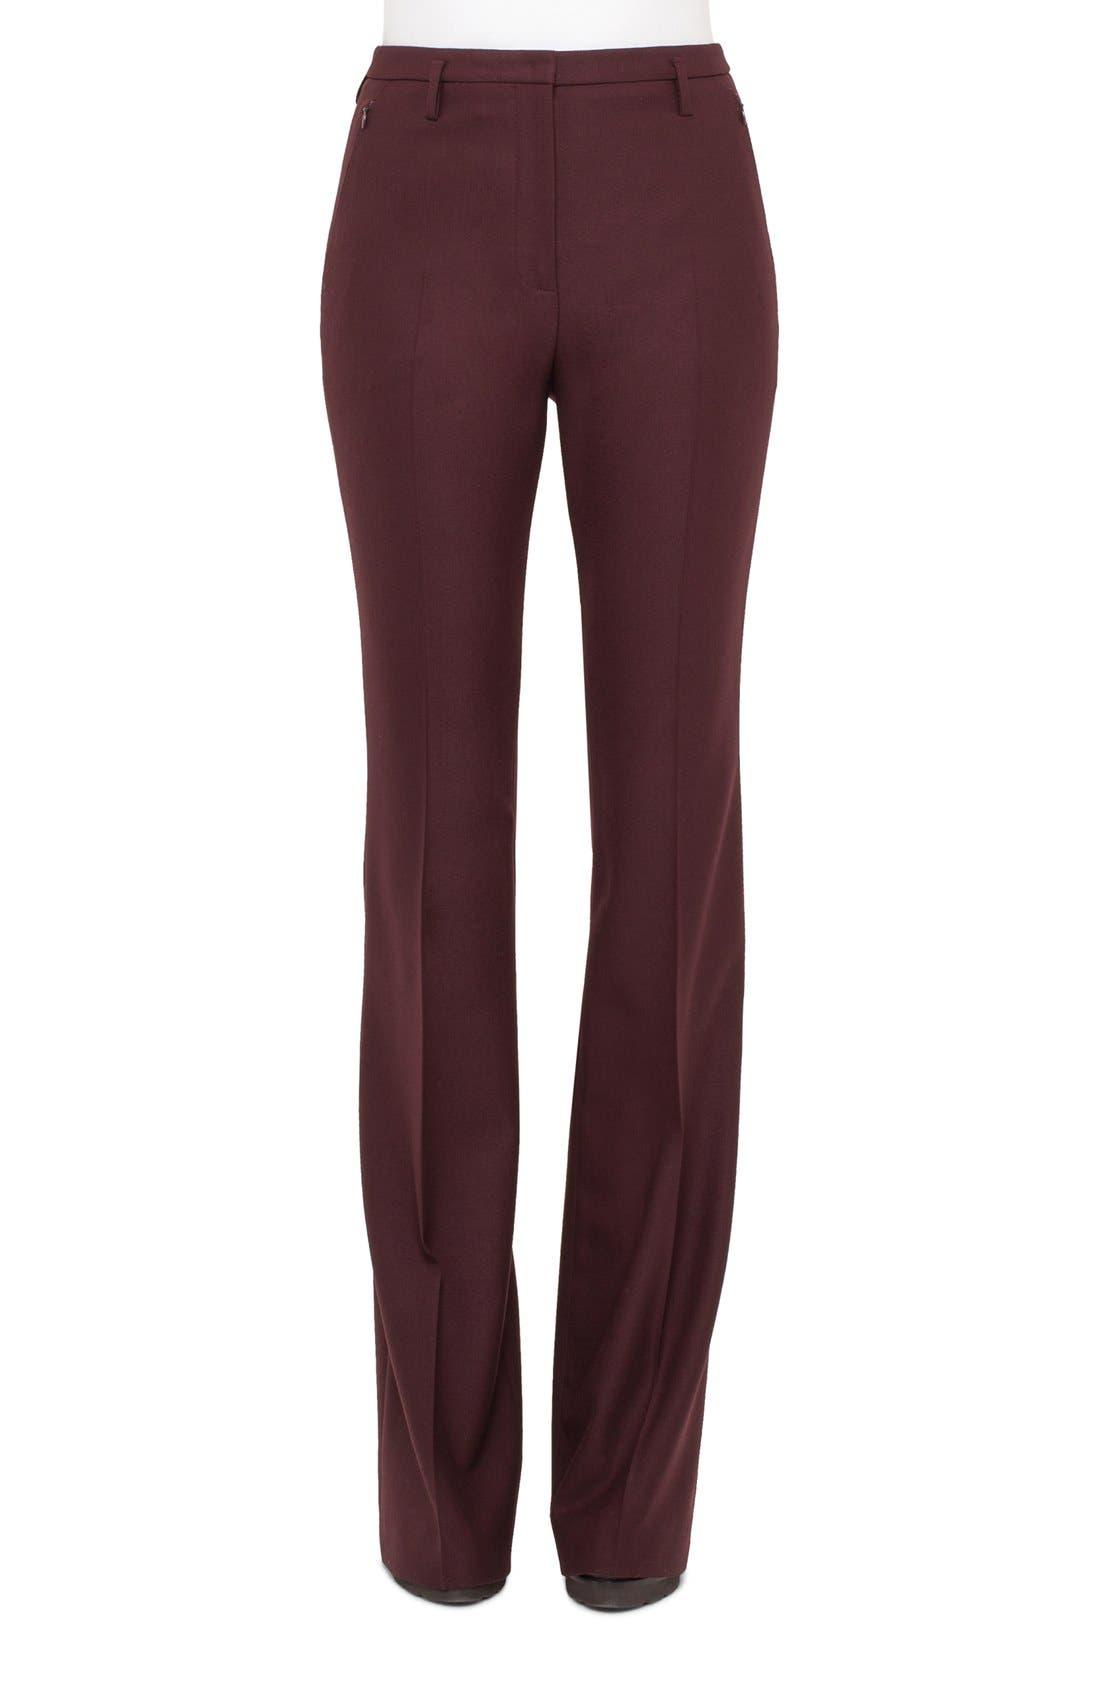 Alternate Image 1 Selected - Akris 'Fairytale' Stretch Wool Flannel Pants